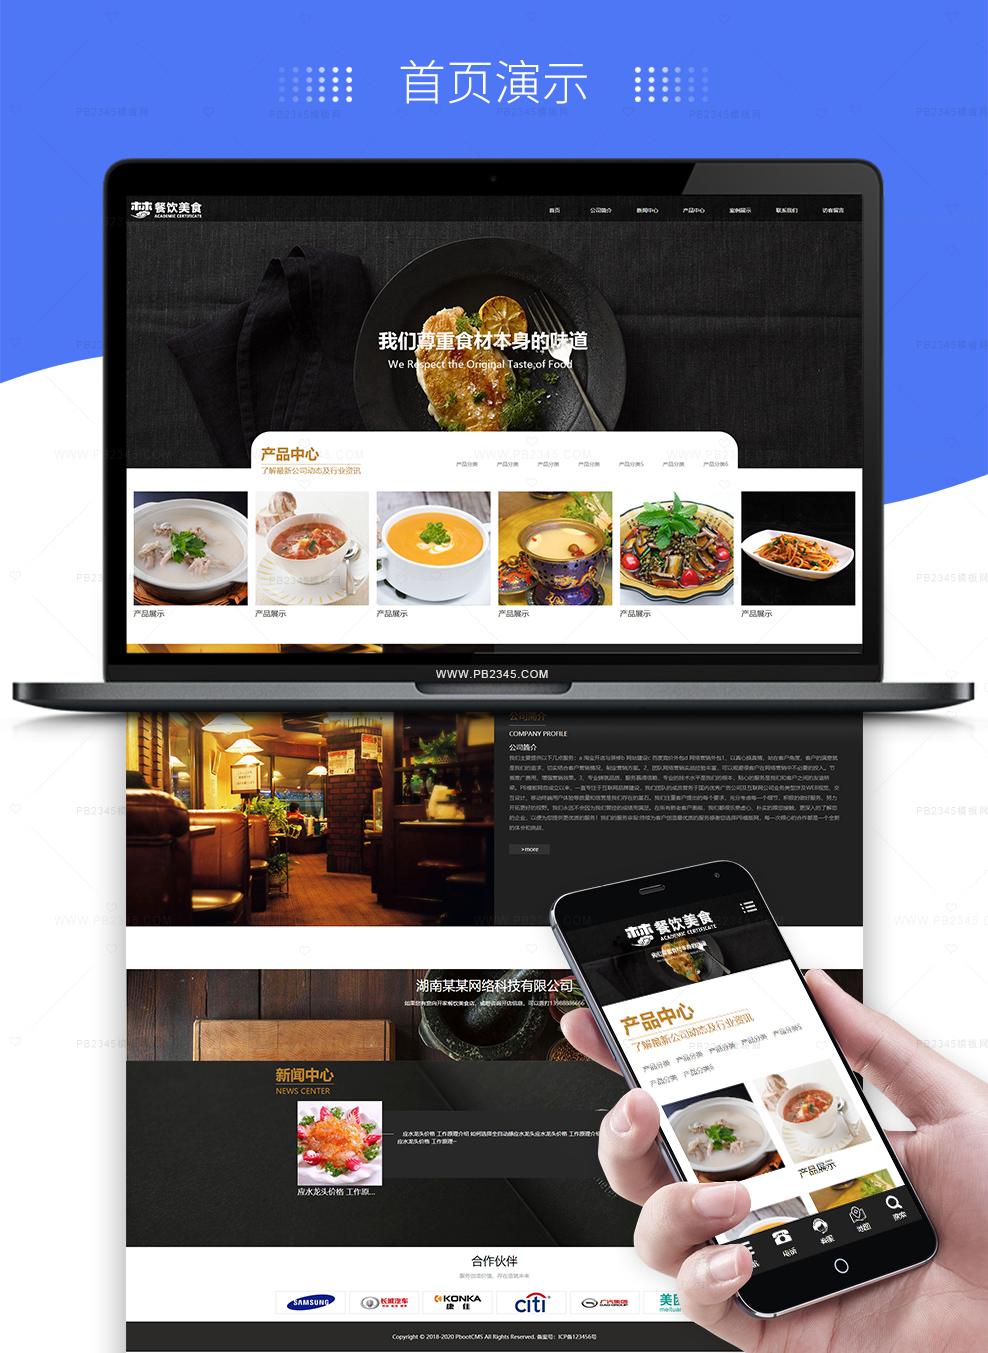 pbootcms自适应餐饮小吃加盟行业网站模板自适应手机端